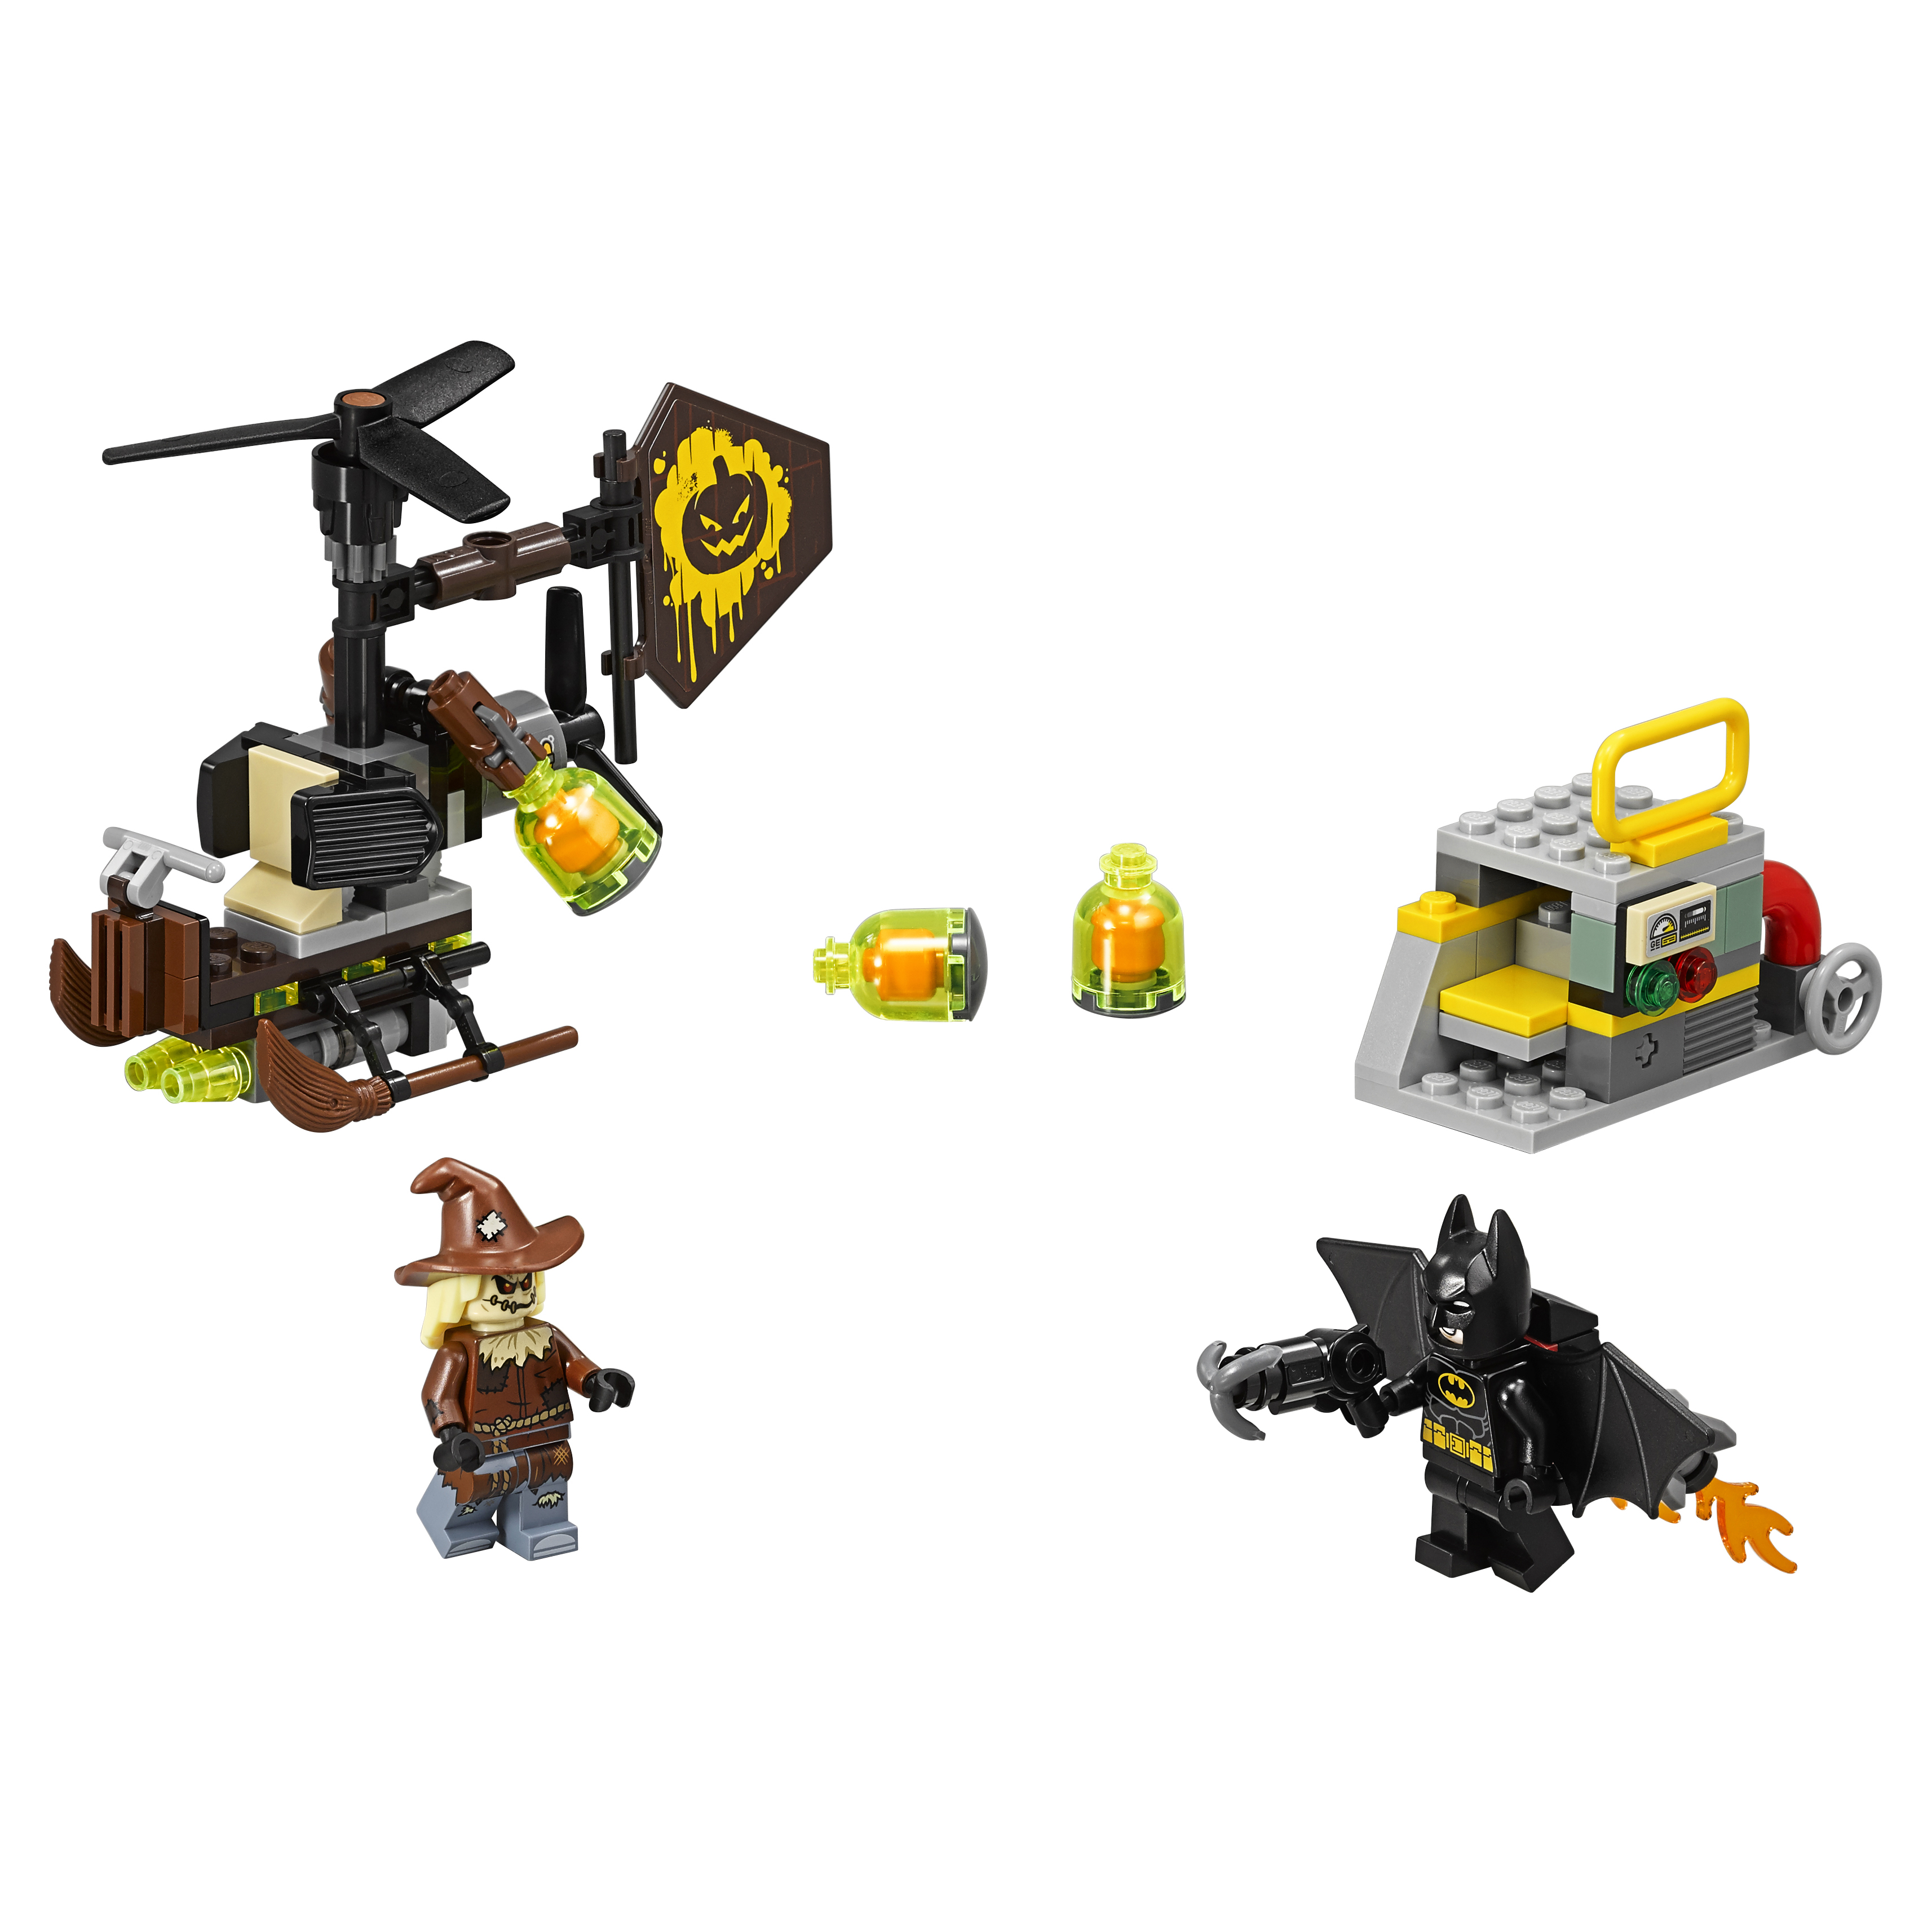 Конструктор LEGO Batman Movie Схватка с Пугалом